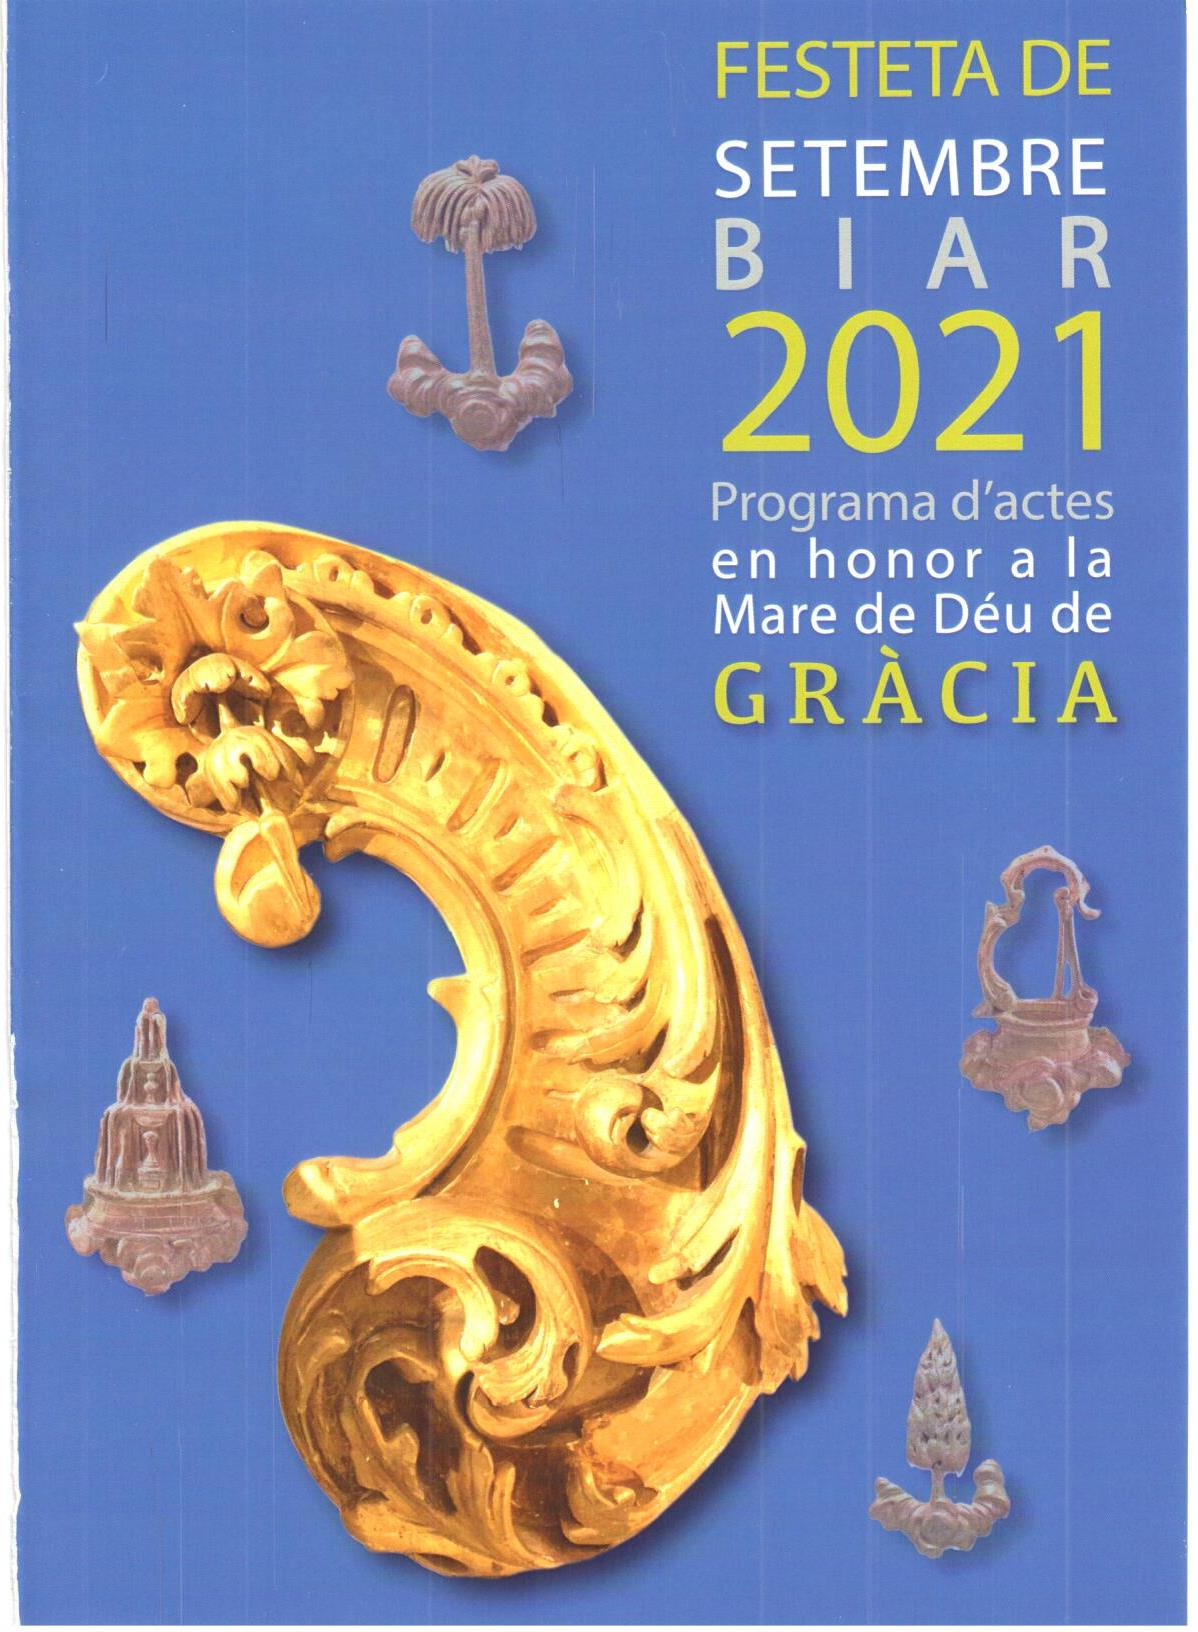 FESTETA 20210001